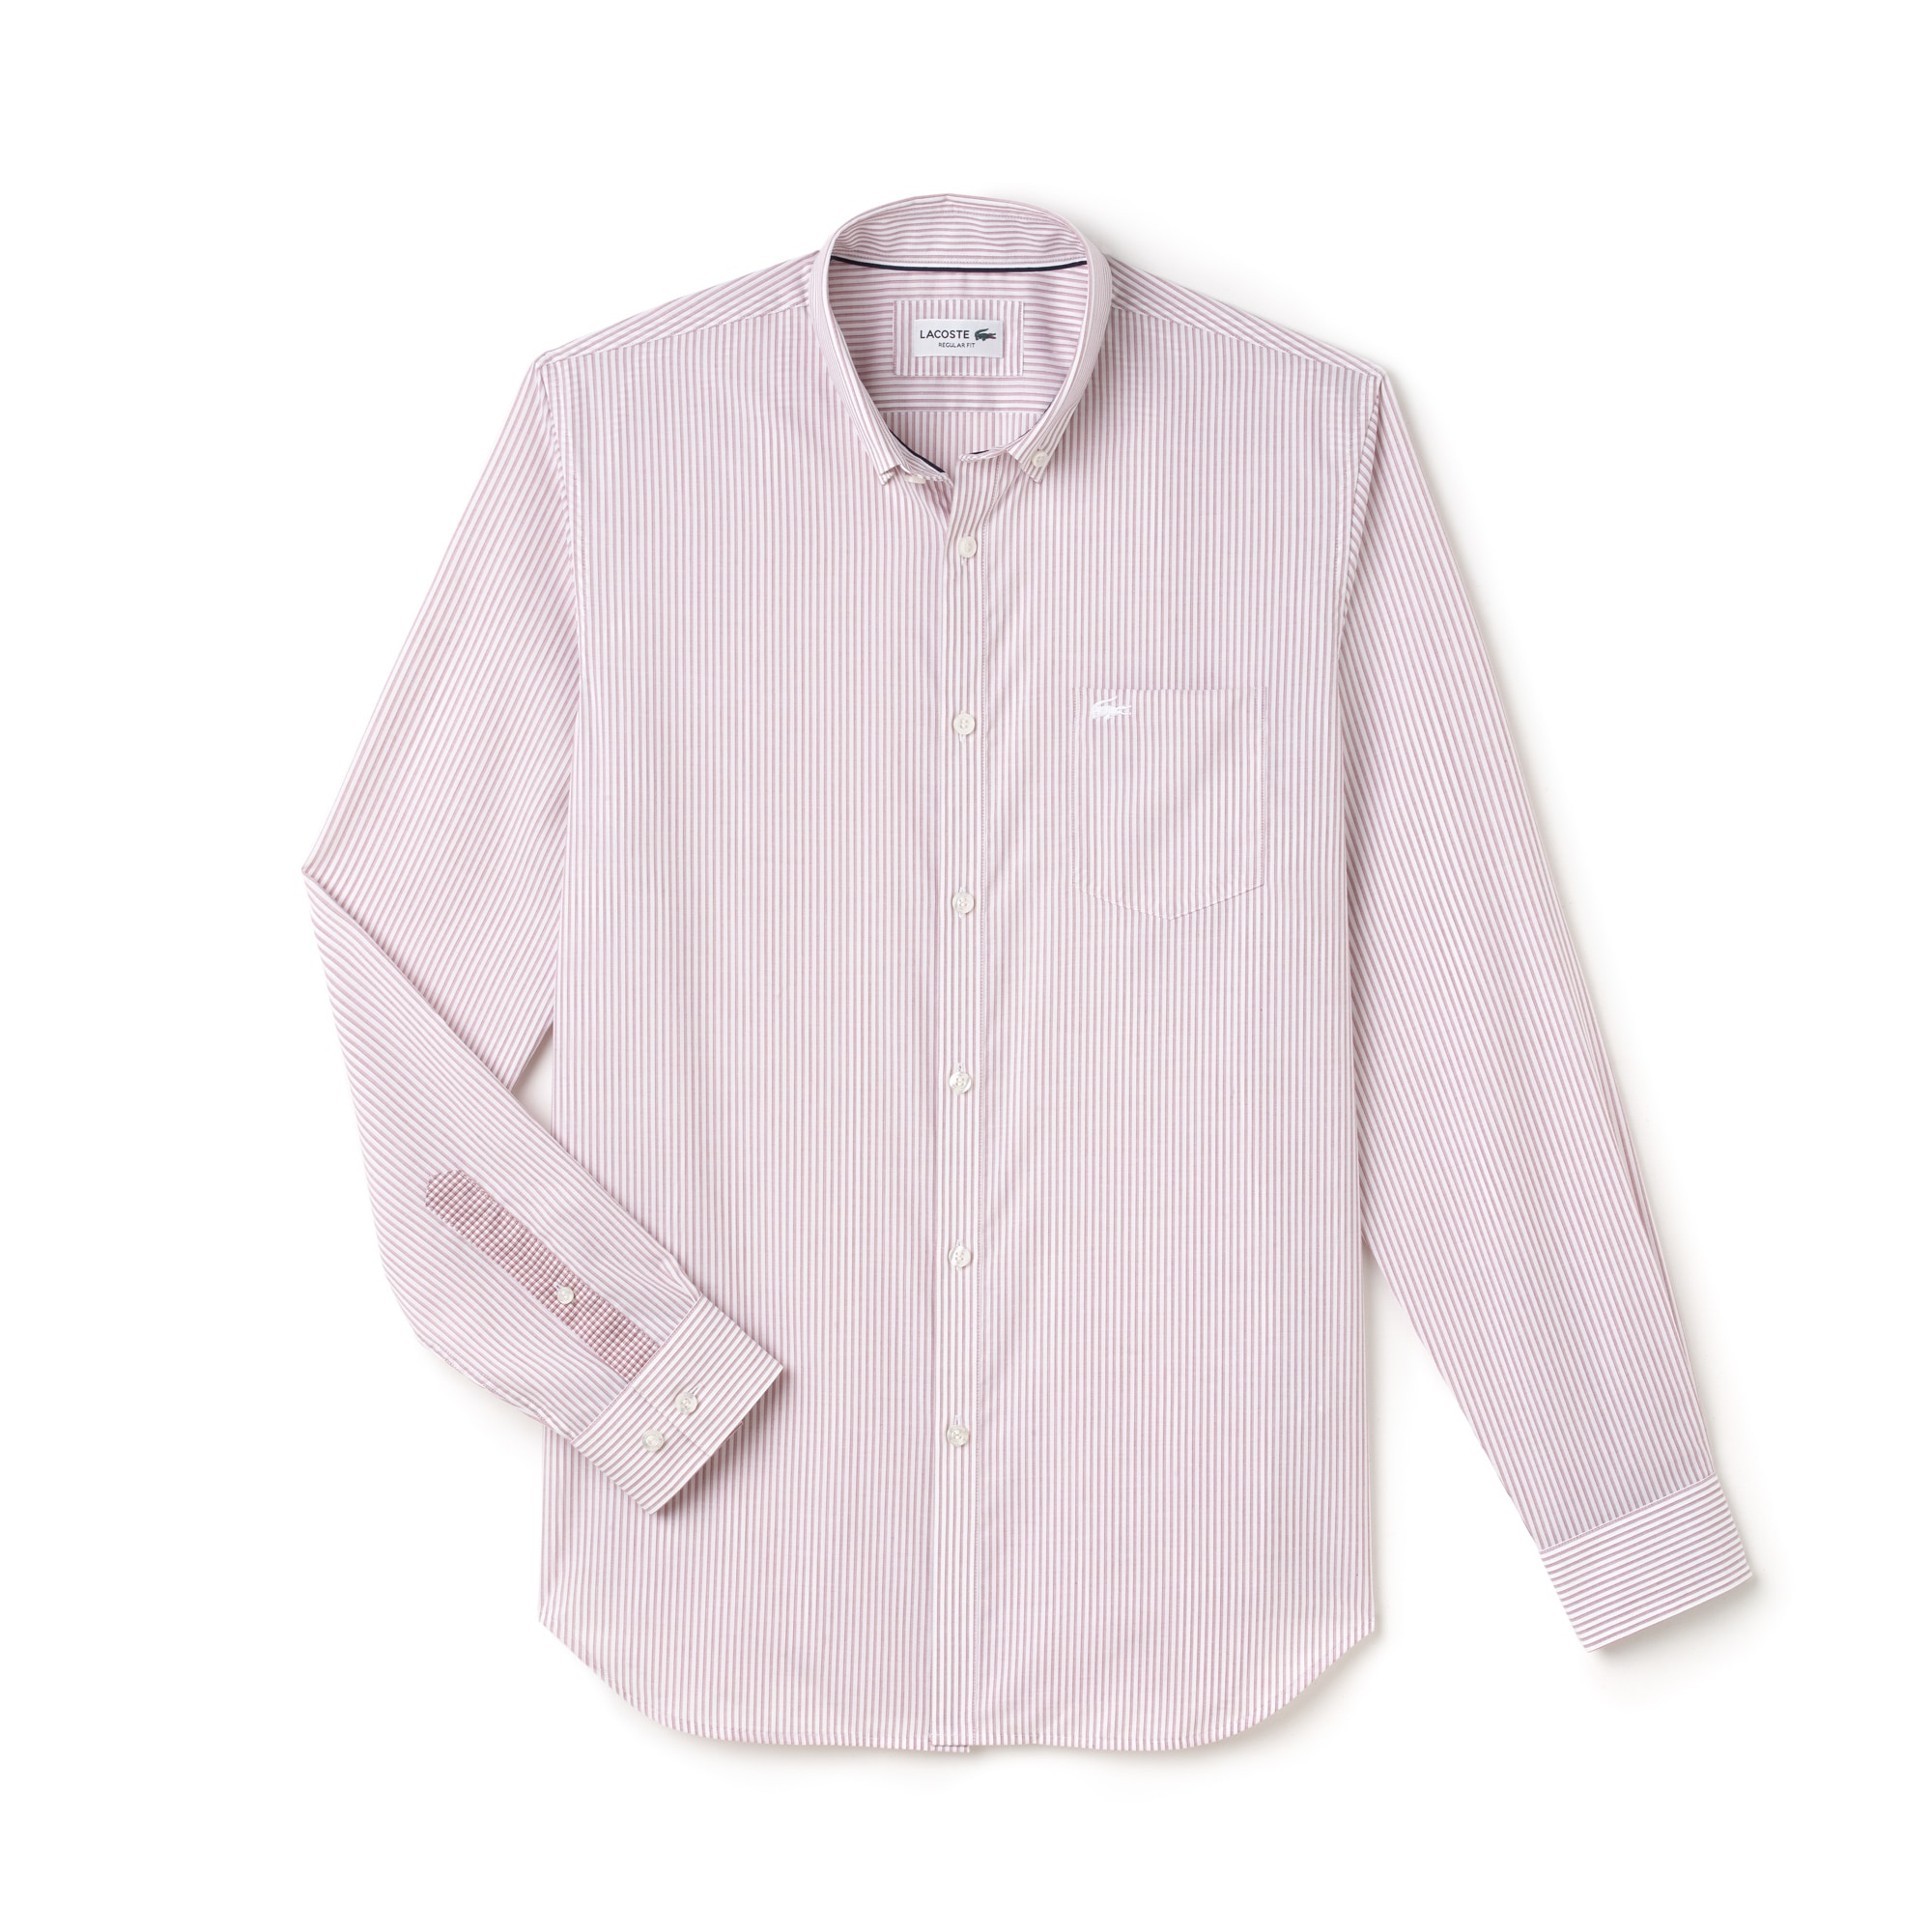 Camisa Regular Fit Masculina em Popeline Listrada